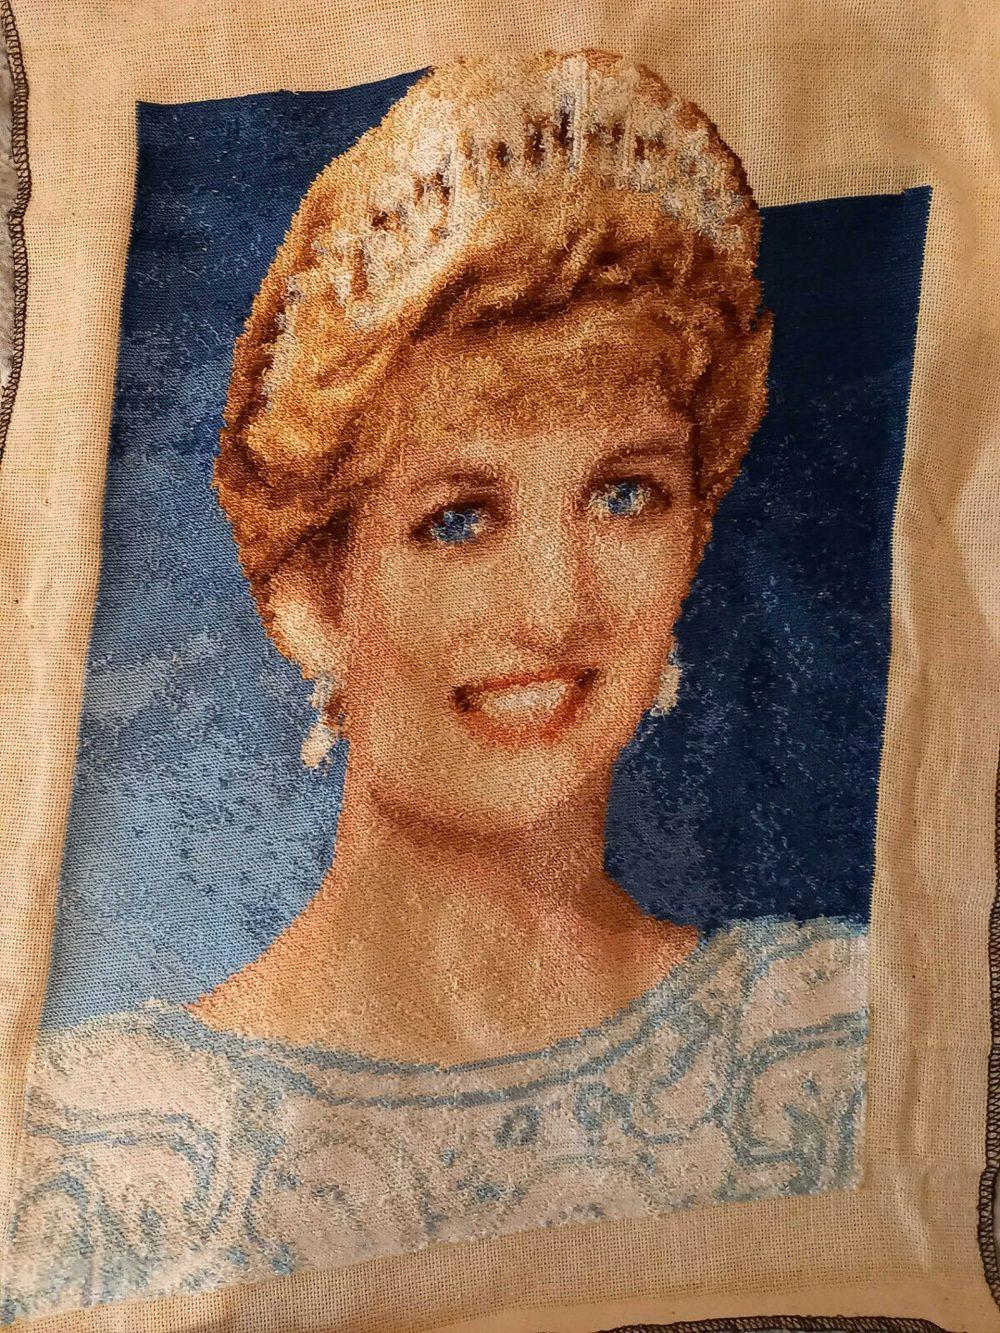 The life-like tapestry - World Art News